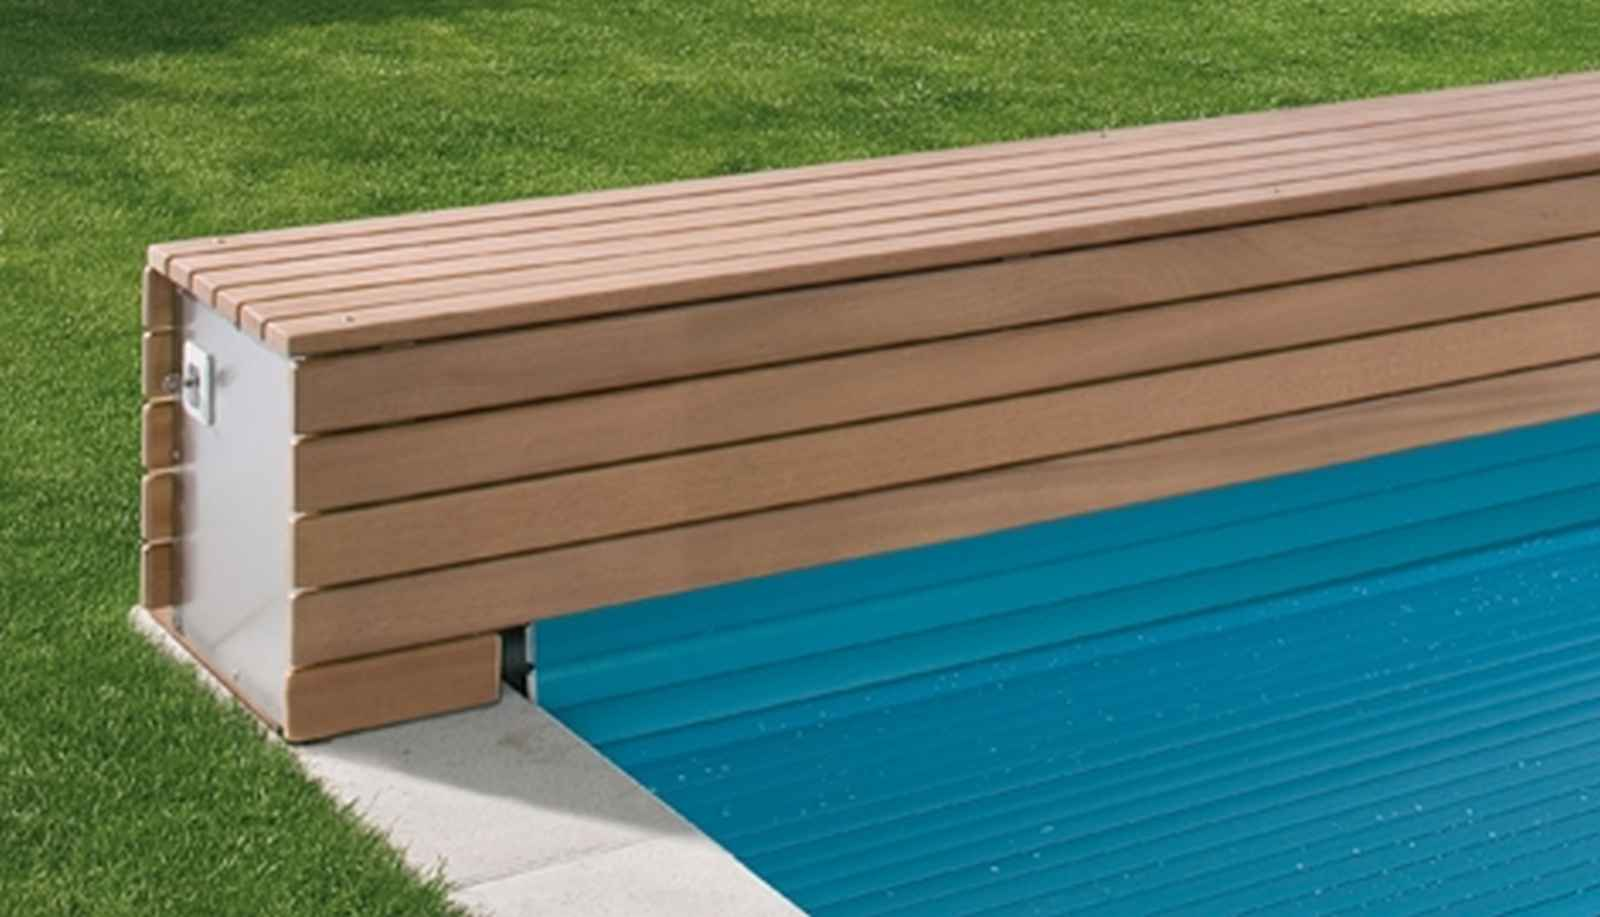 tschapovets schwimmbad technik. Black Bedroom Furniture Sets. Home Design Ideas